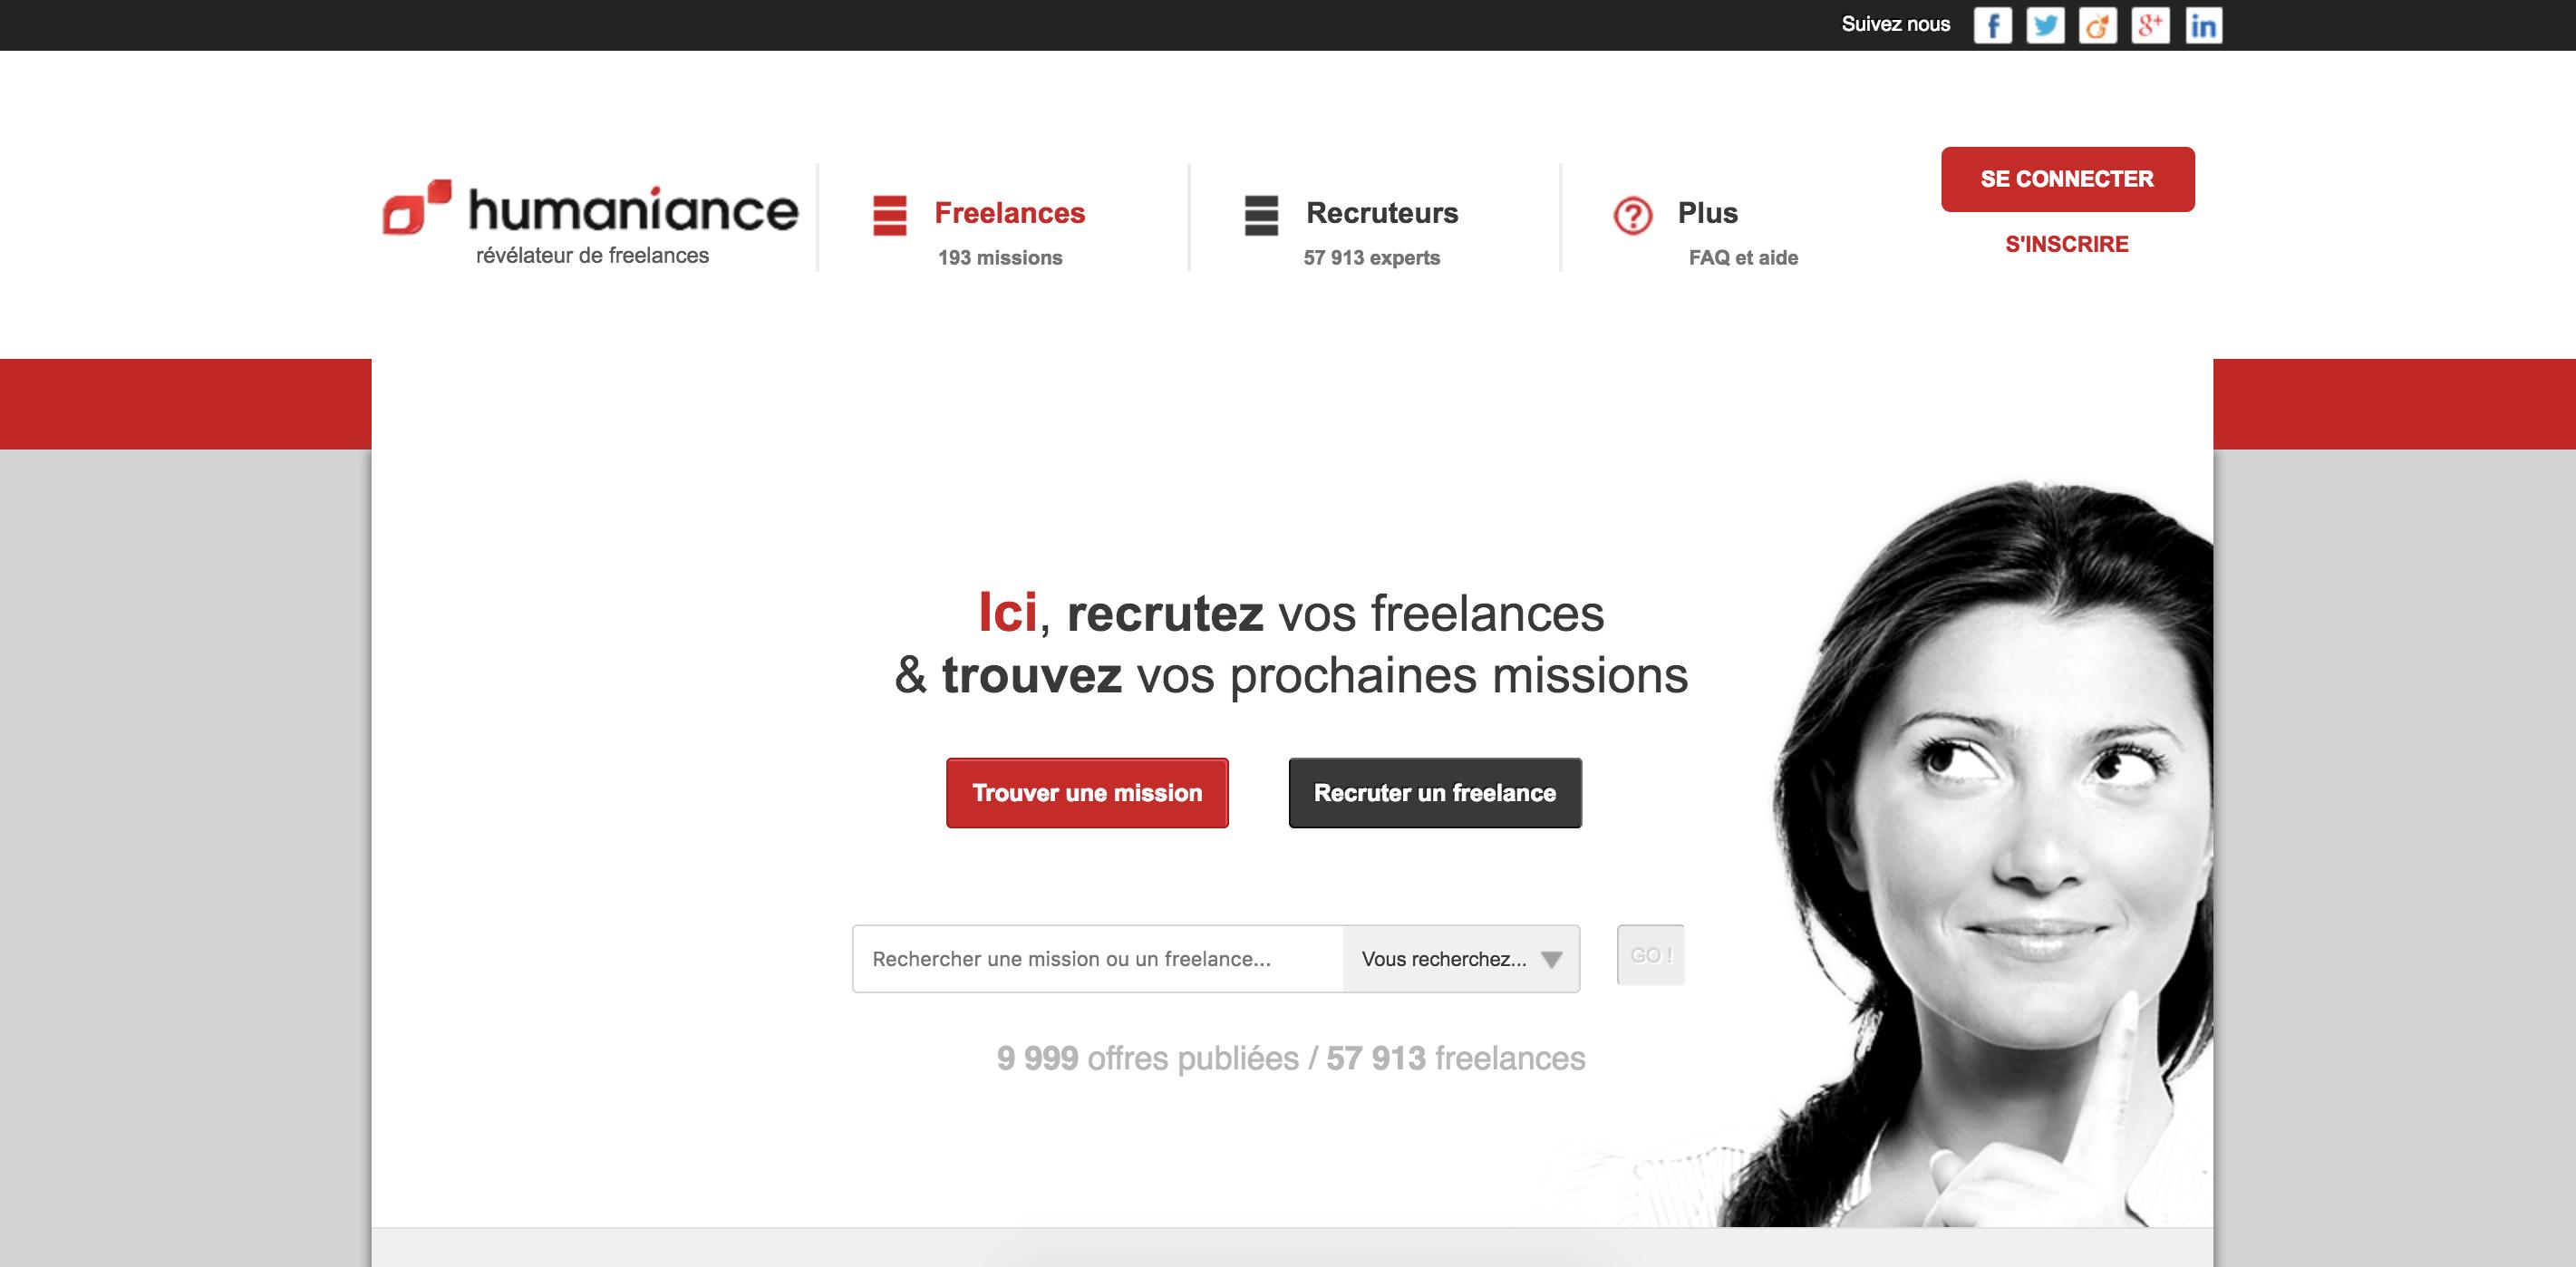 humaniance-plateforme-freelance